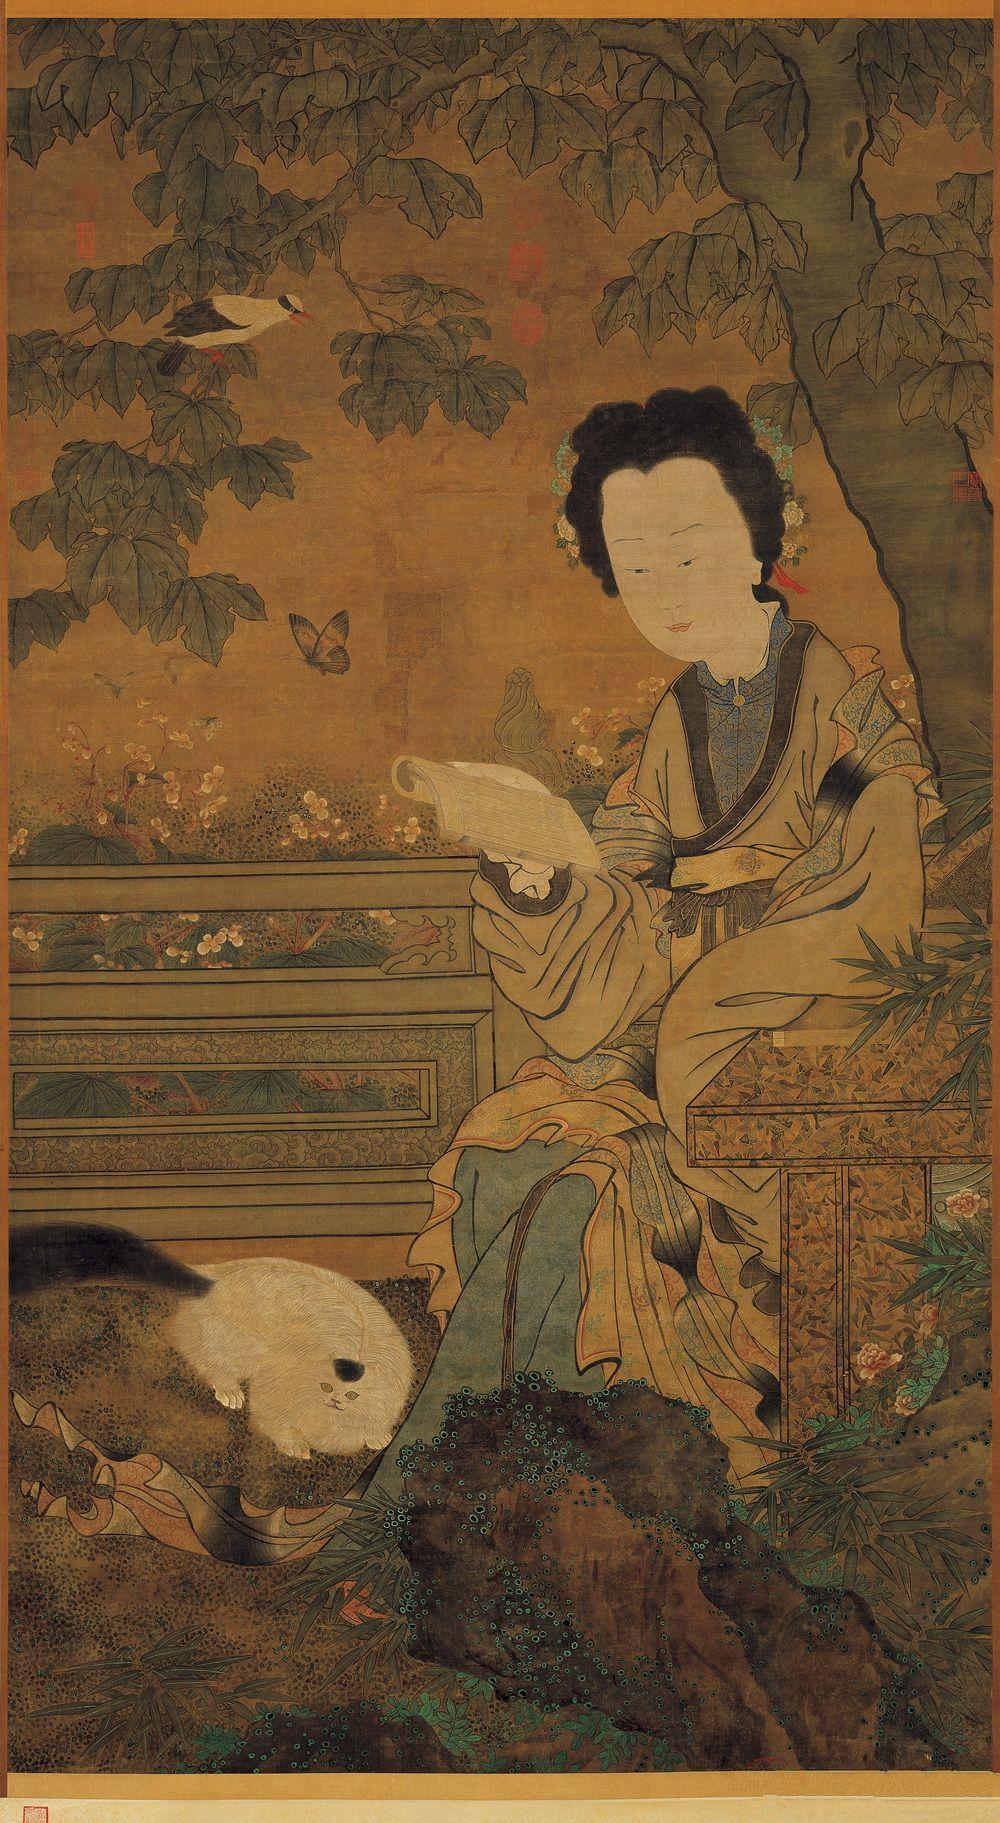 周文矩 仕女图 台北故宫 Peinture Chinoise Peinture Chine